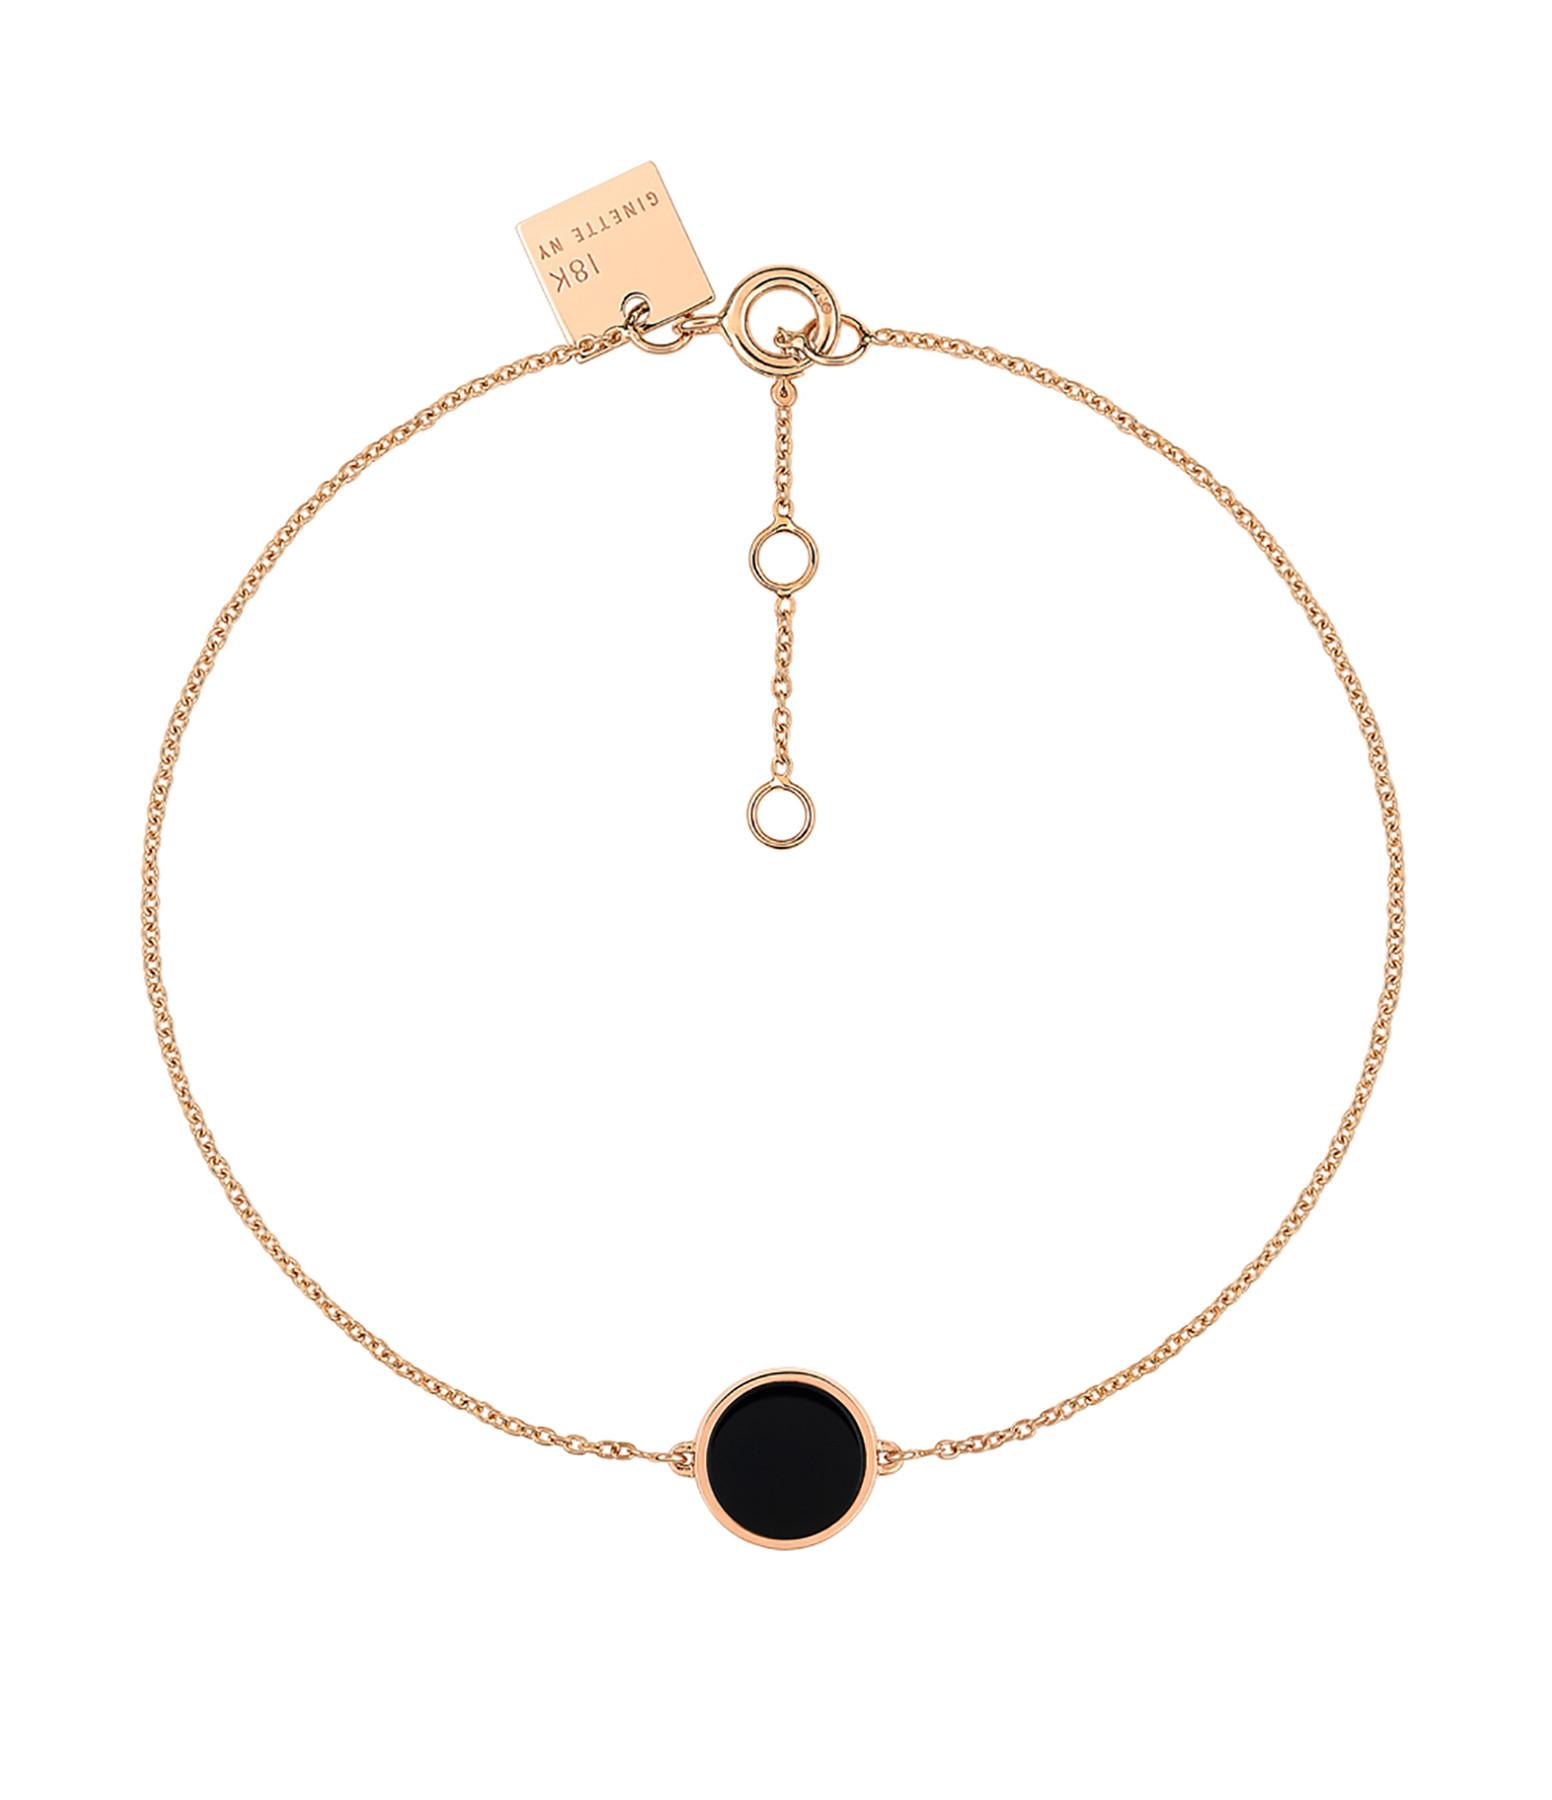 GINETTE NY - Bracelet Ever Mini Disc Or Rose Onyx